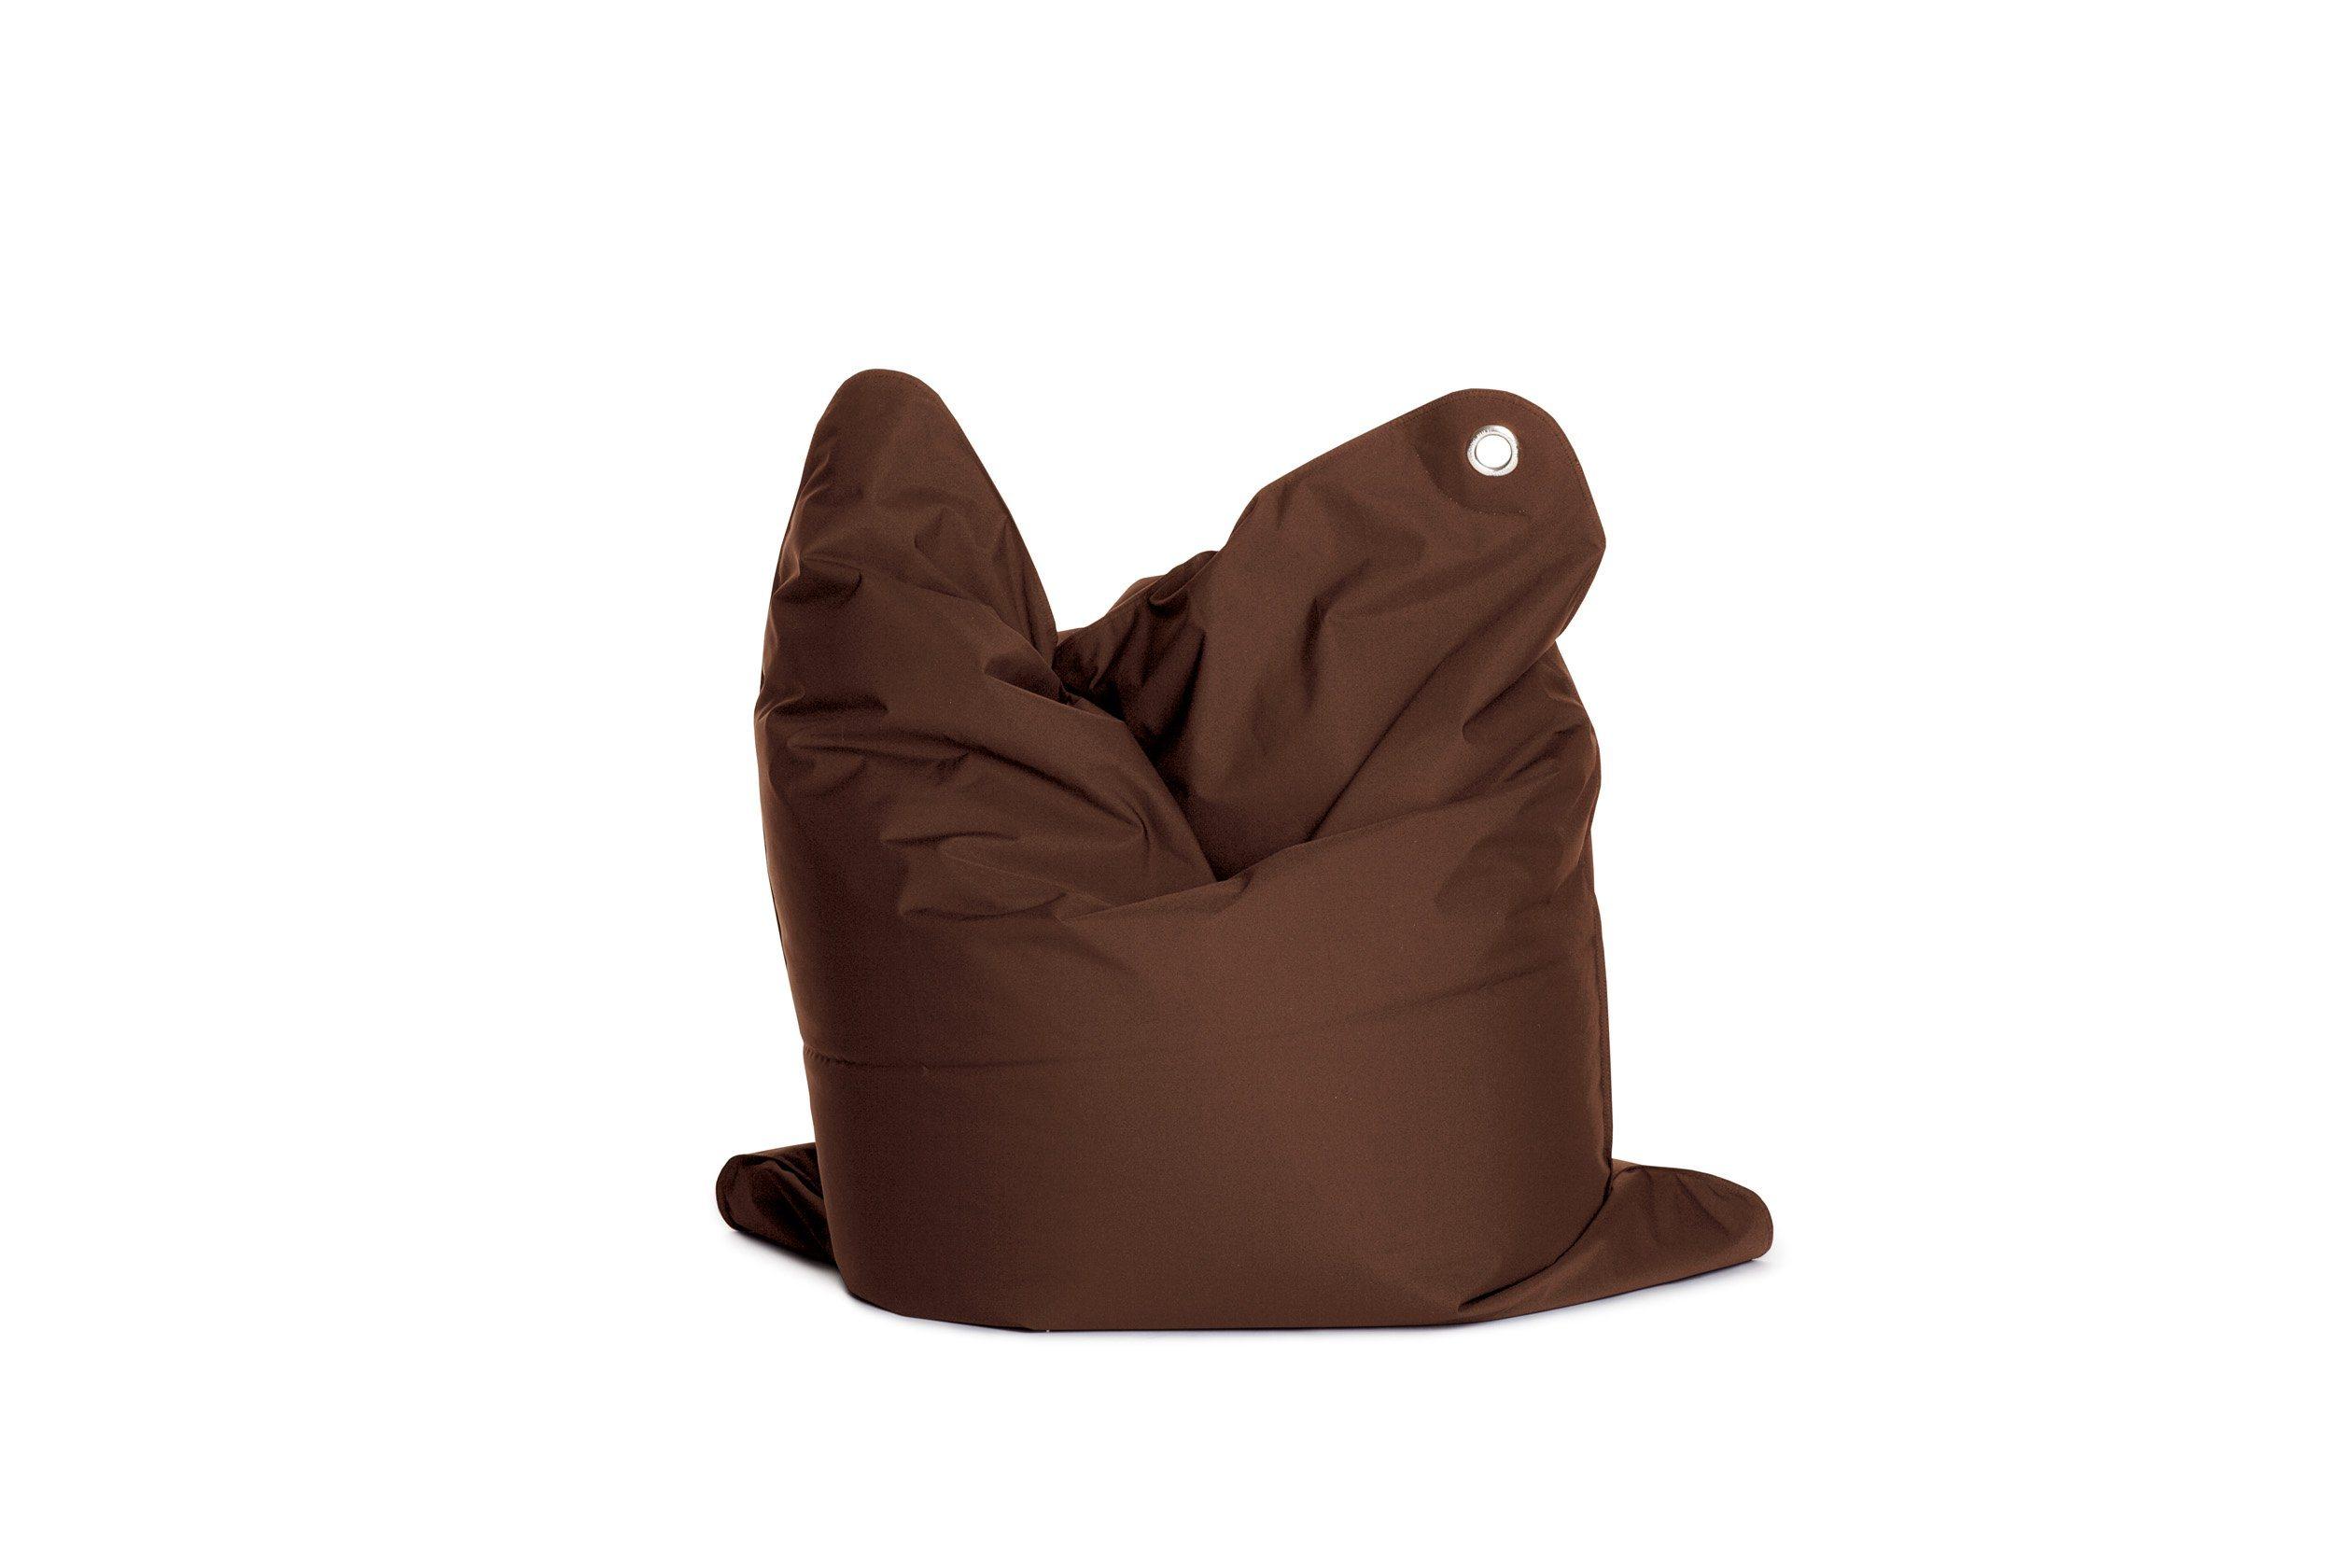 Sitting-Bull Sitzsack »Medium Bull« | Wohnzimmer > Sessel > Sitzsaecke | Textil - Polyester | SITTING-BULL